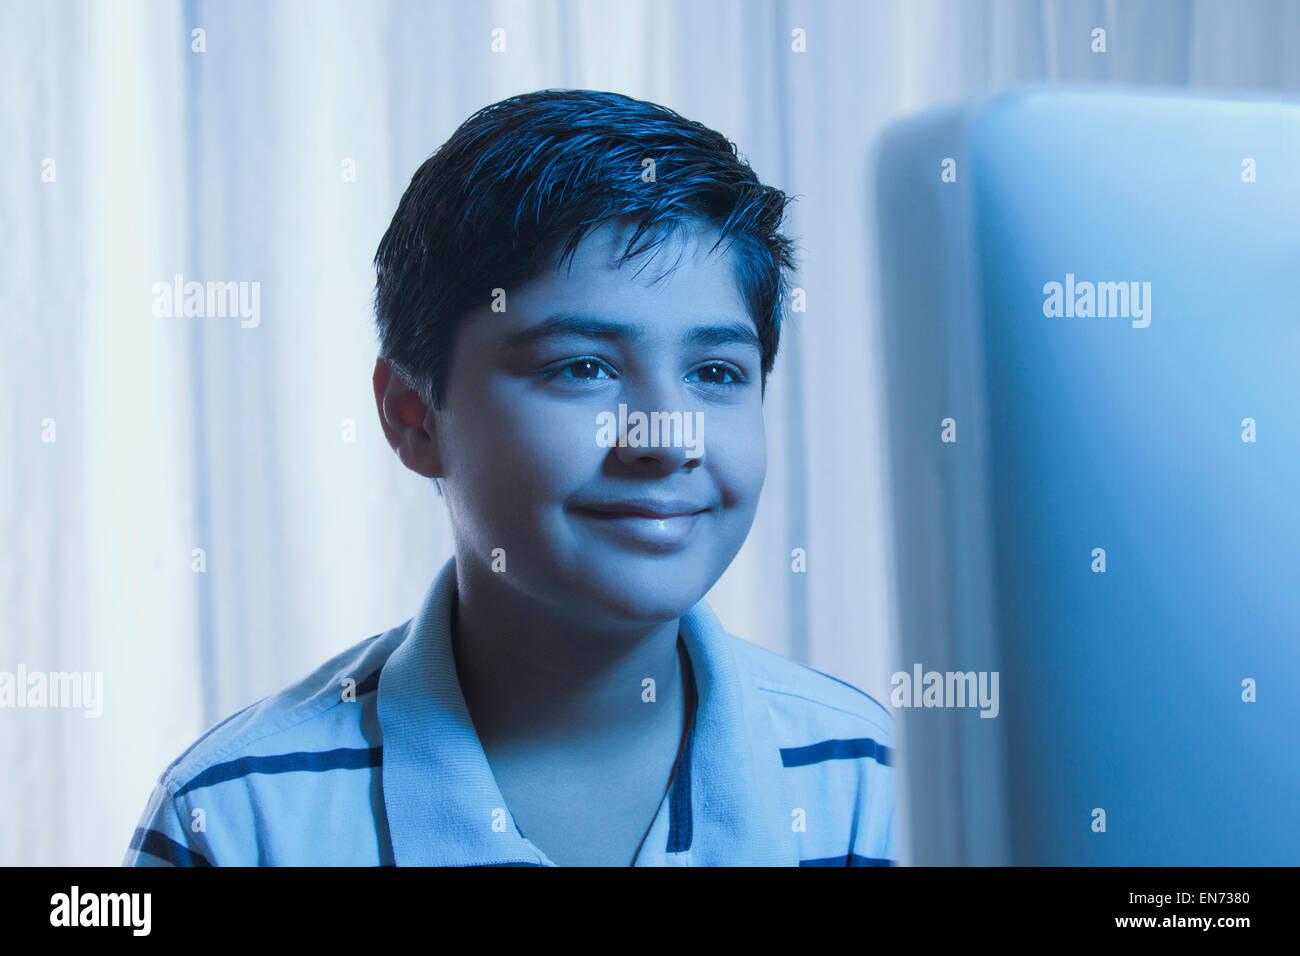 Young boy looking at a computer monitor - Stock Image